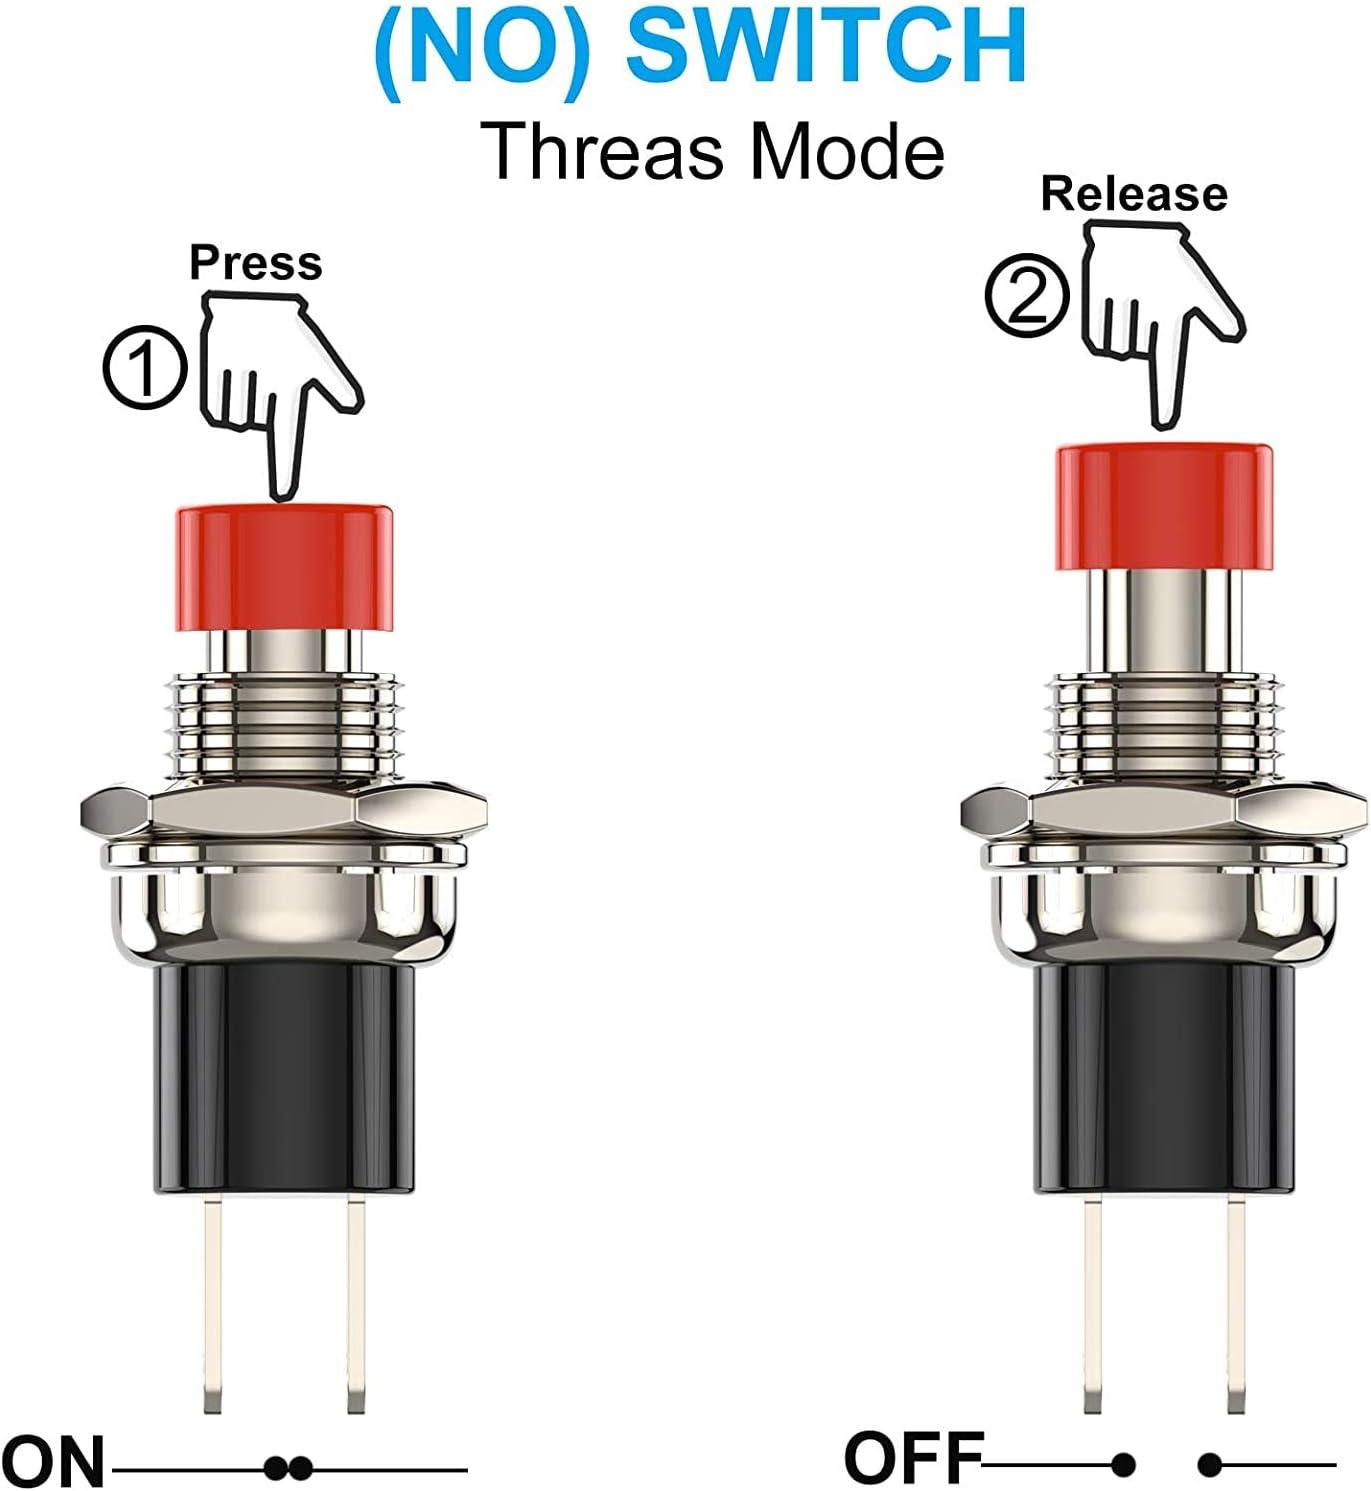 VISSQH 30Pcs Mini Momentary Push Button Switch for Model Railway Hobby Arduino DIY 7mm 1A 250V AC 2 Pins SPST